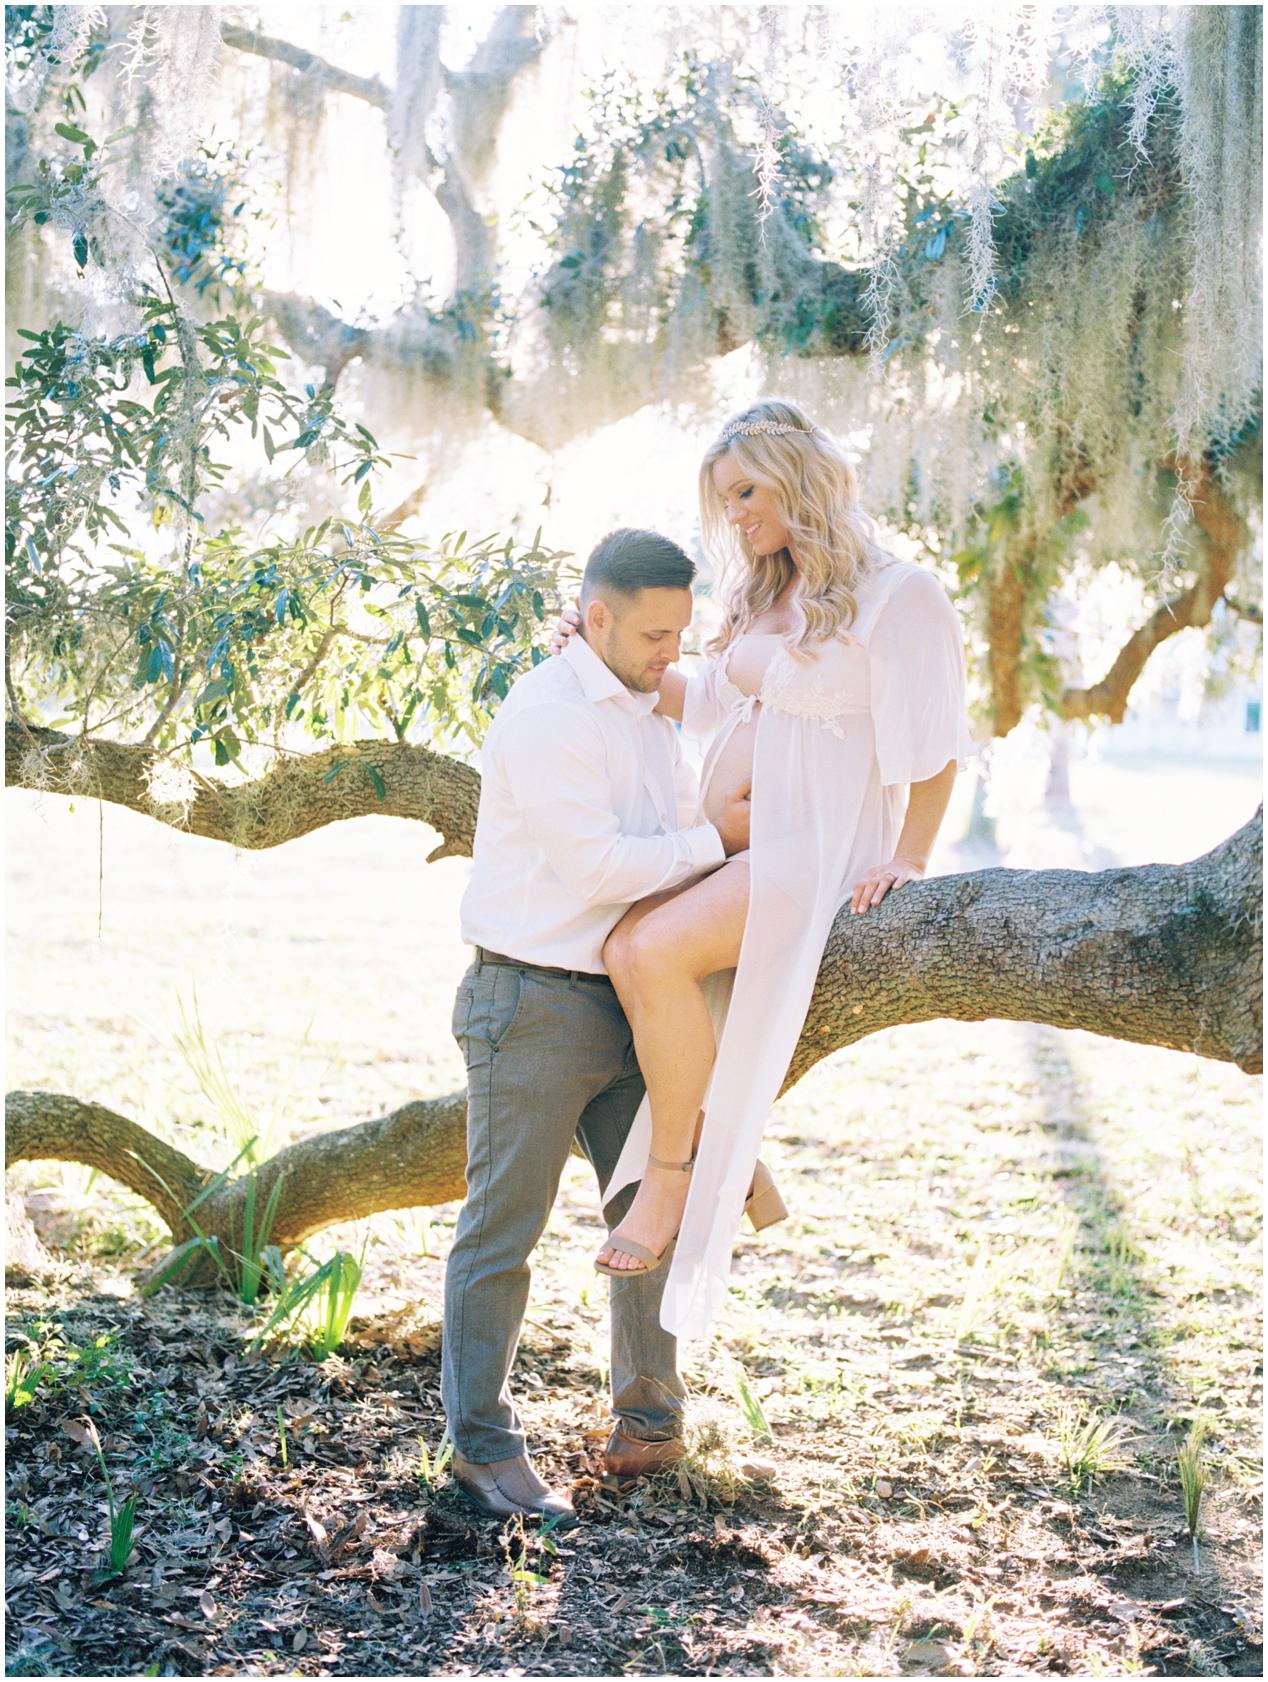 Lisa Silva Photography -Maternity Session at Cumberland Island, Georgia - Jacksonville and North East Florida Fine Art Film Photographer_0023.jpg